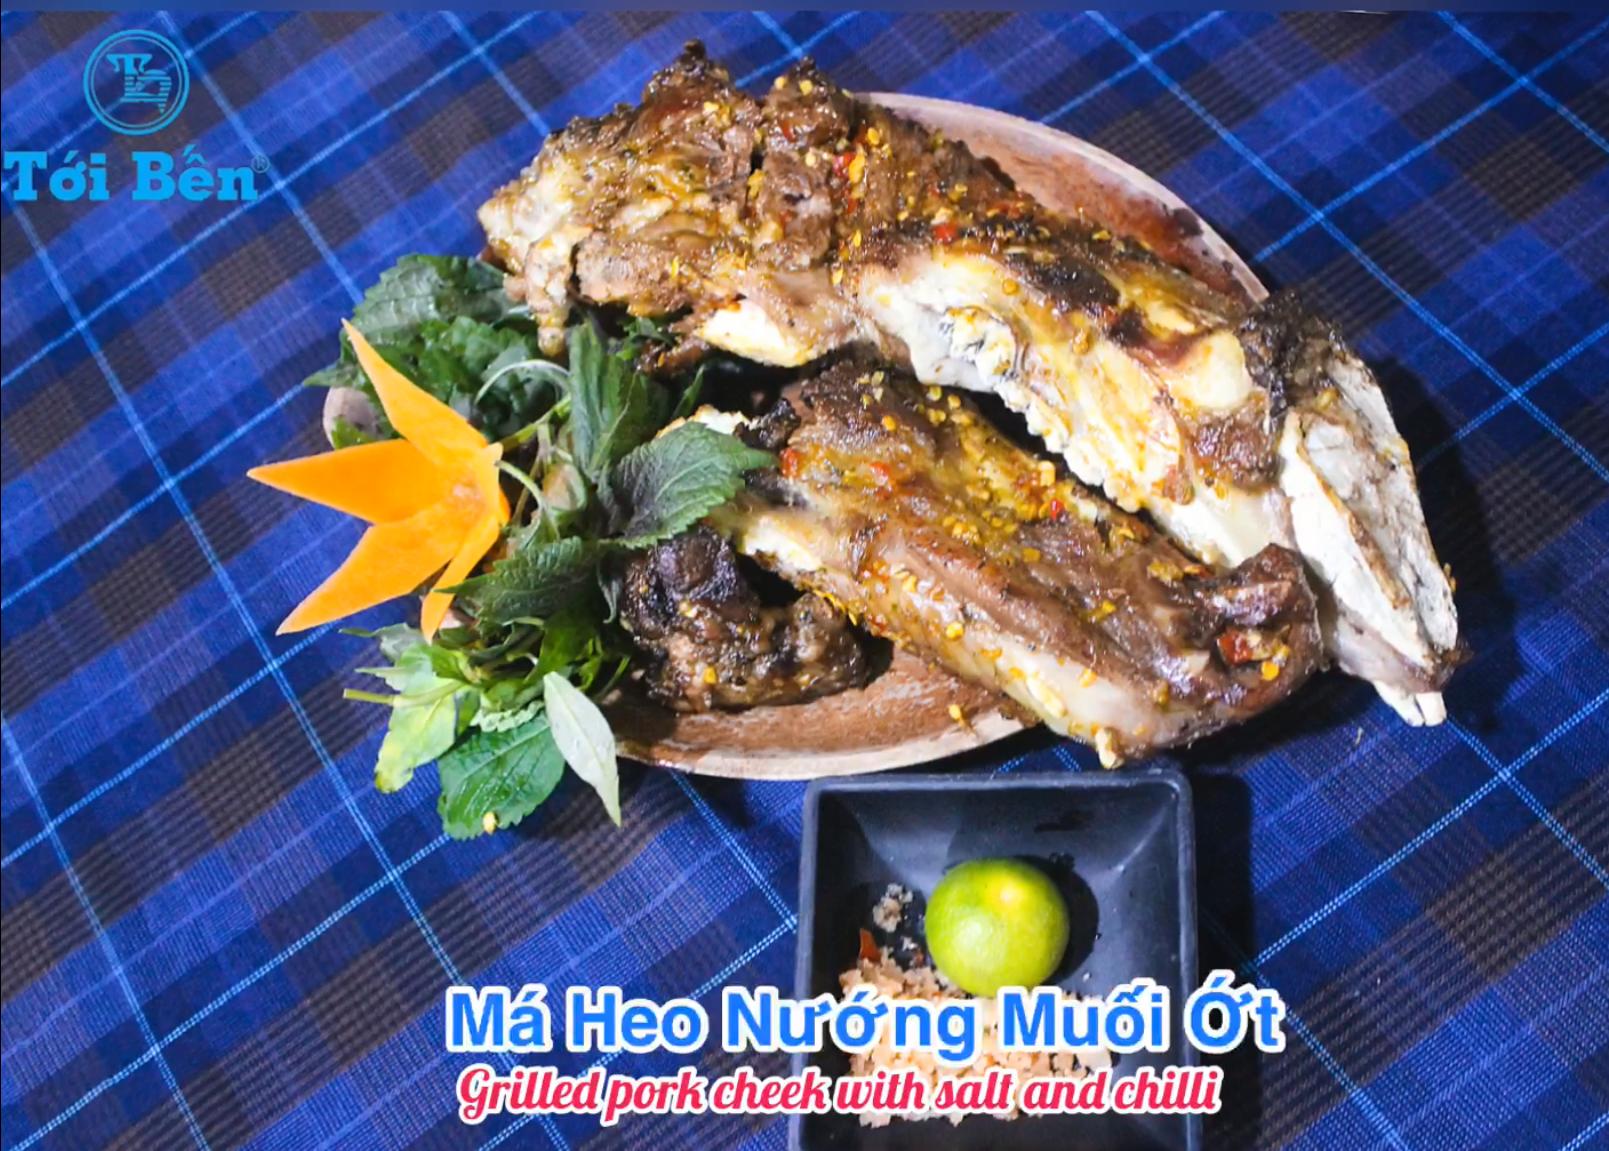 maheonuong